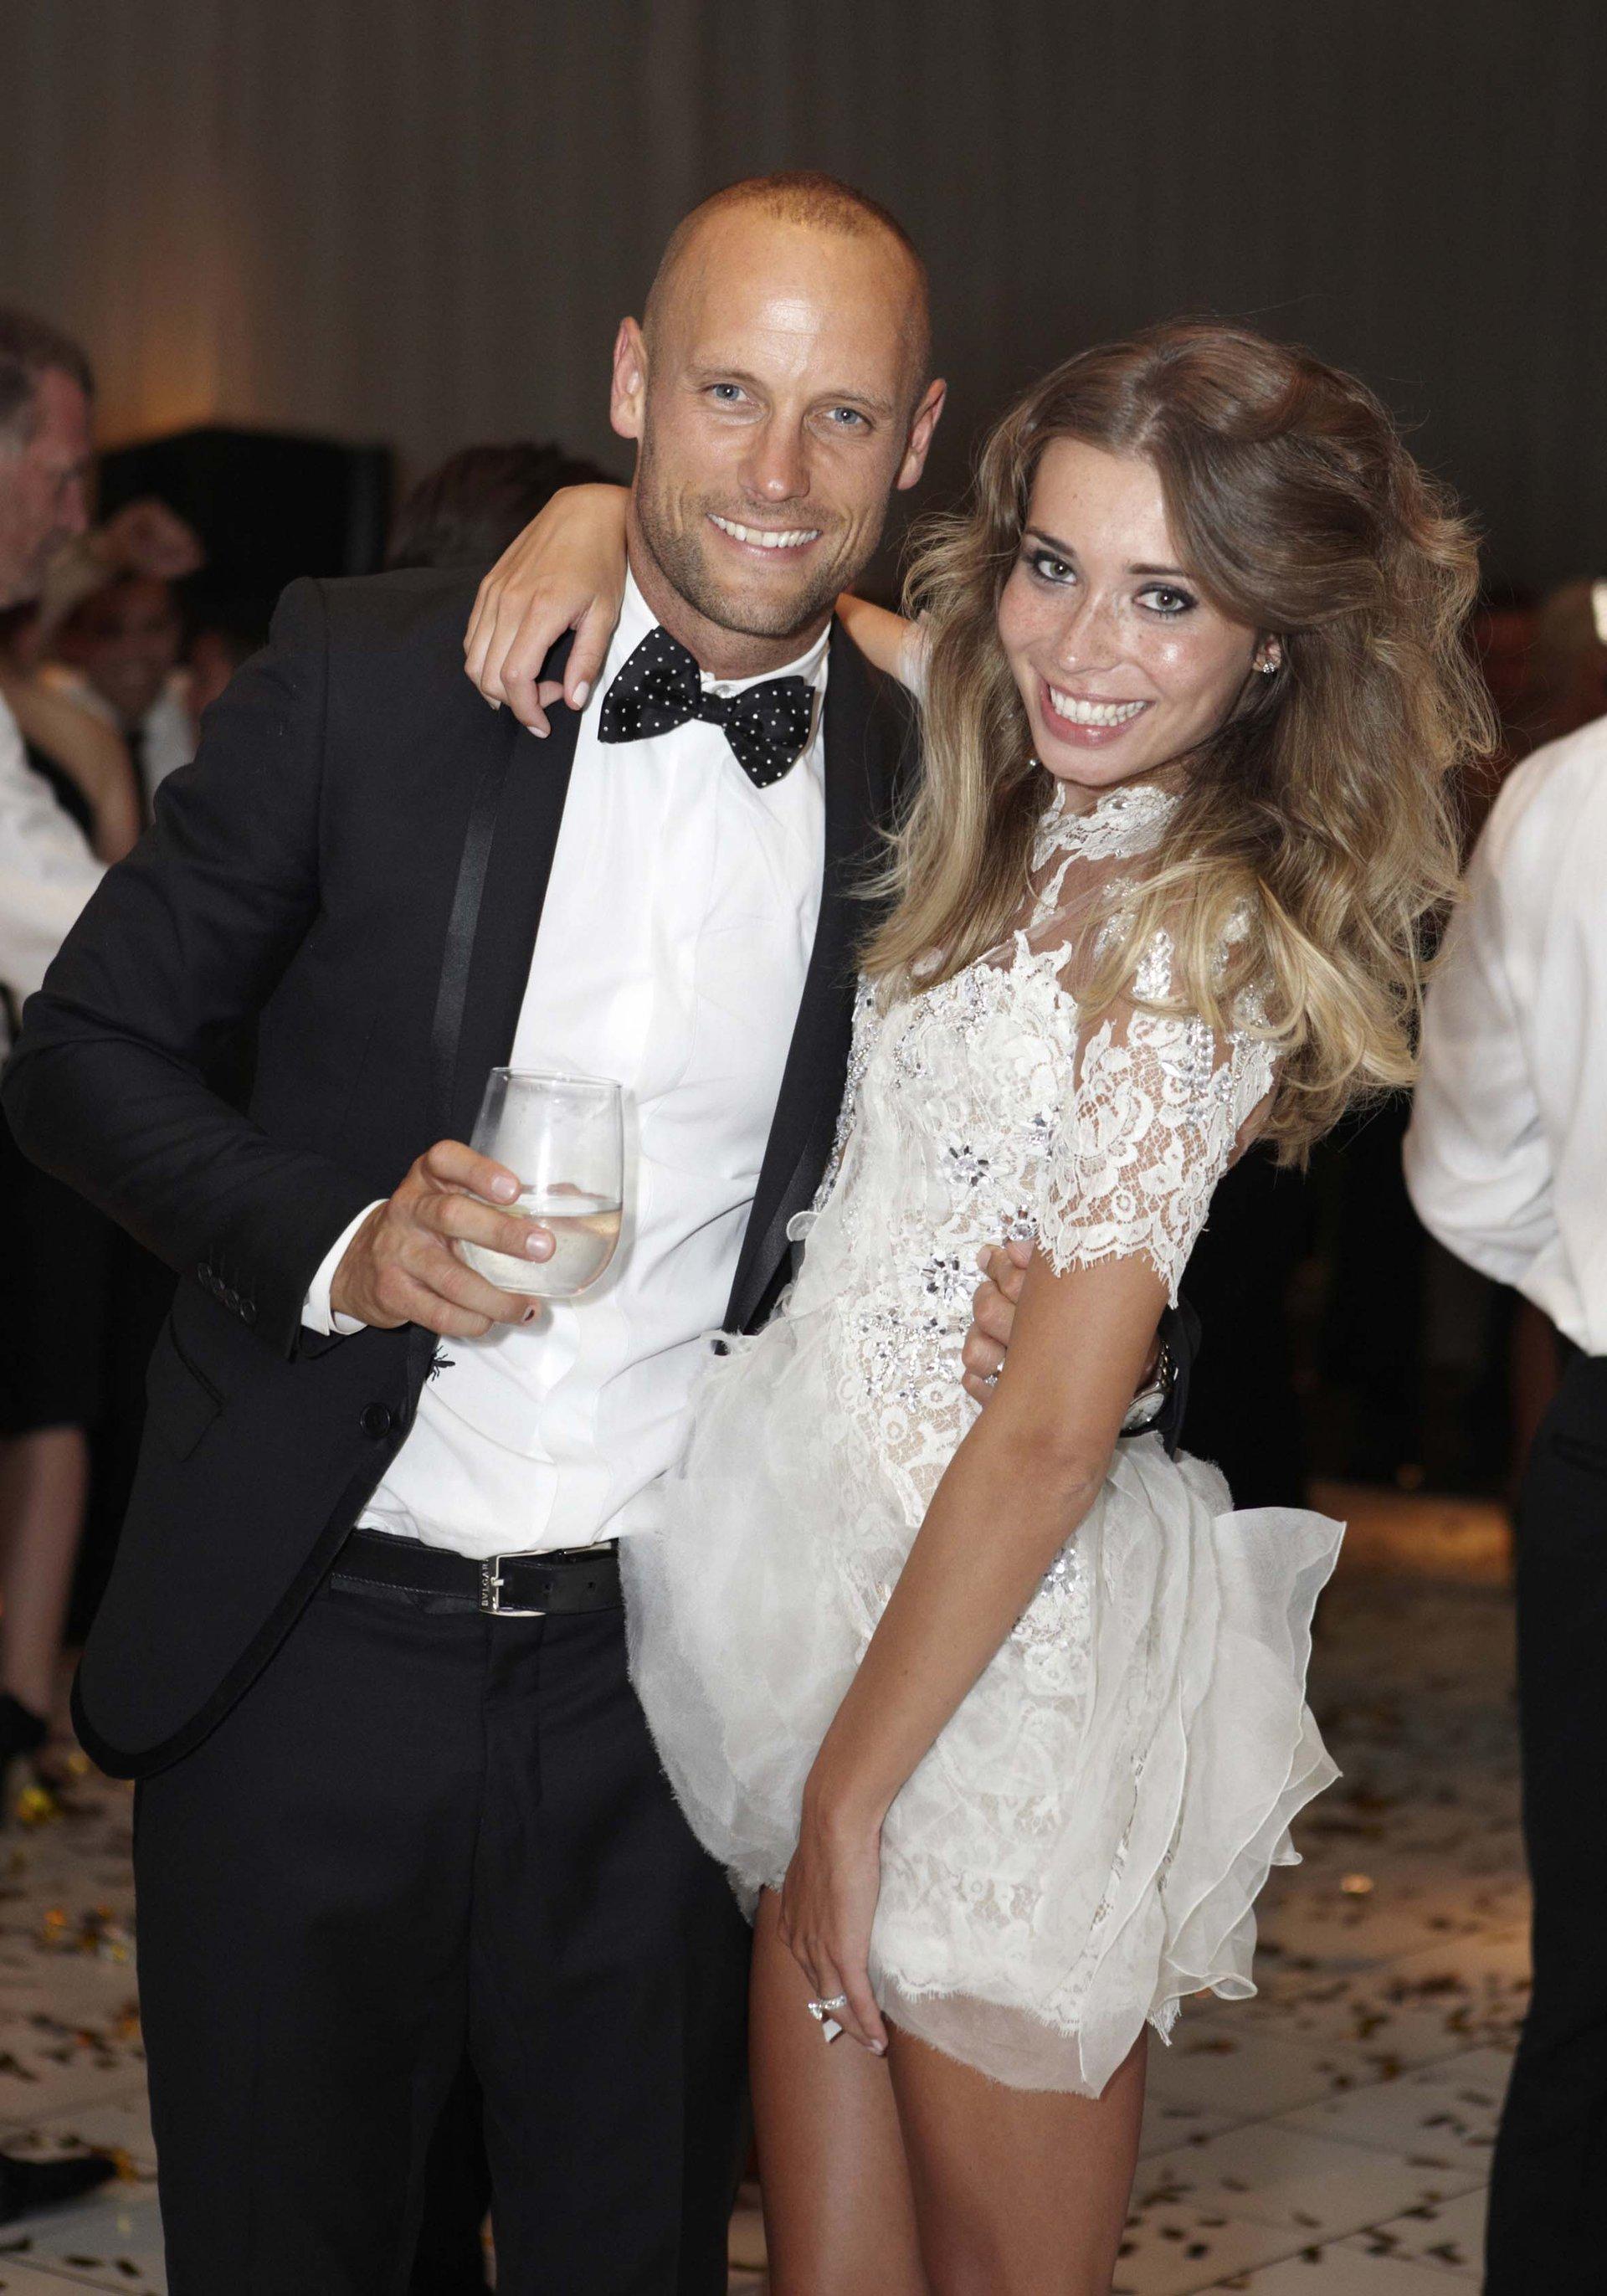 Rozalia And Nicks Wedding At Luminare